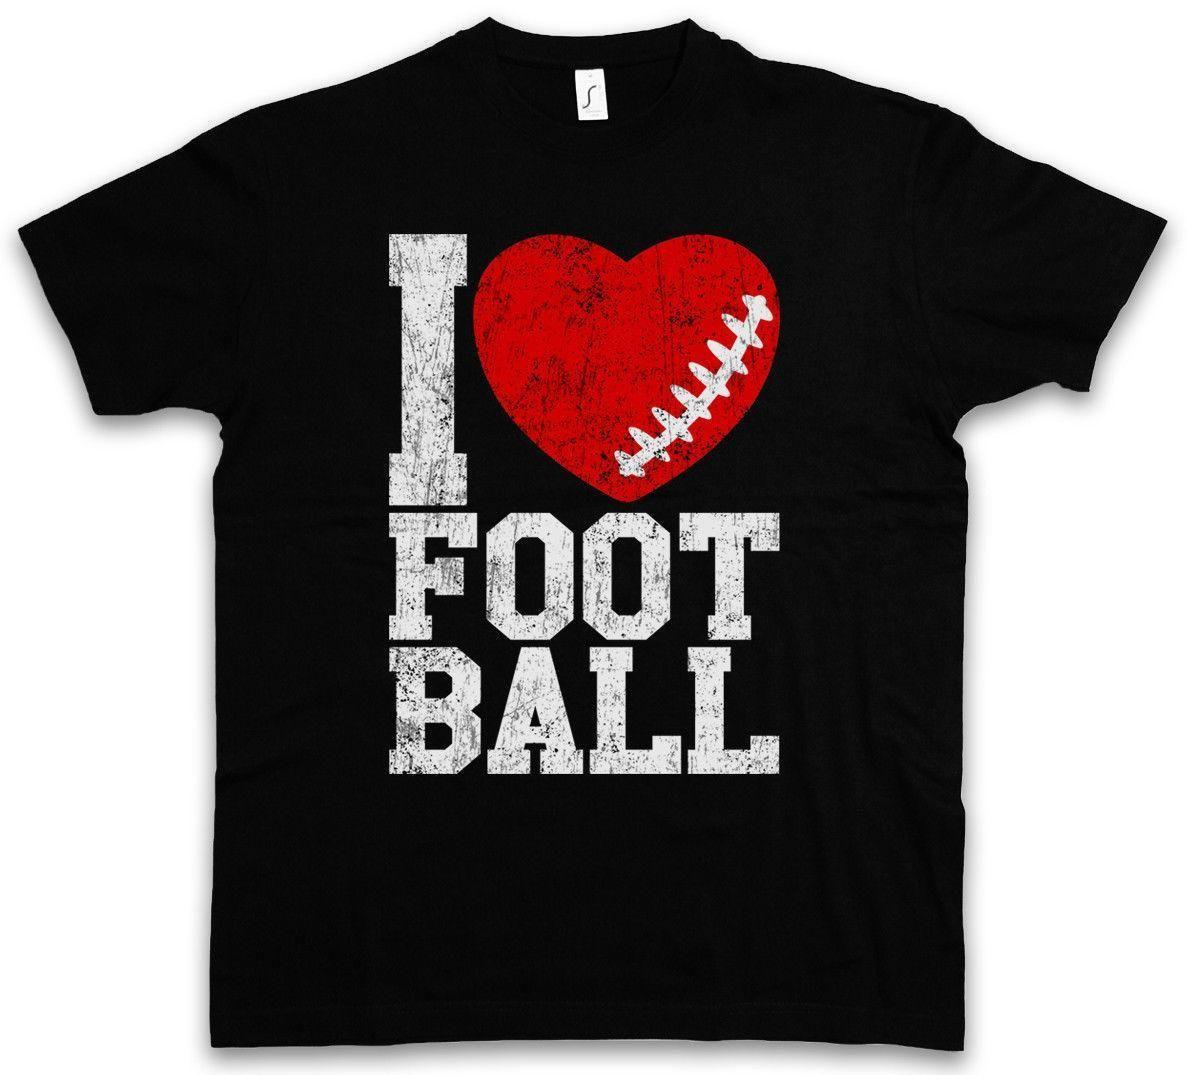 I Love Football III T Shirt Hearts Heart Love Addicted Addiction Ball Foot  Tea Shirts Fun Tshirts From Amesion91 873f1e5ec